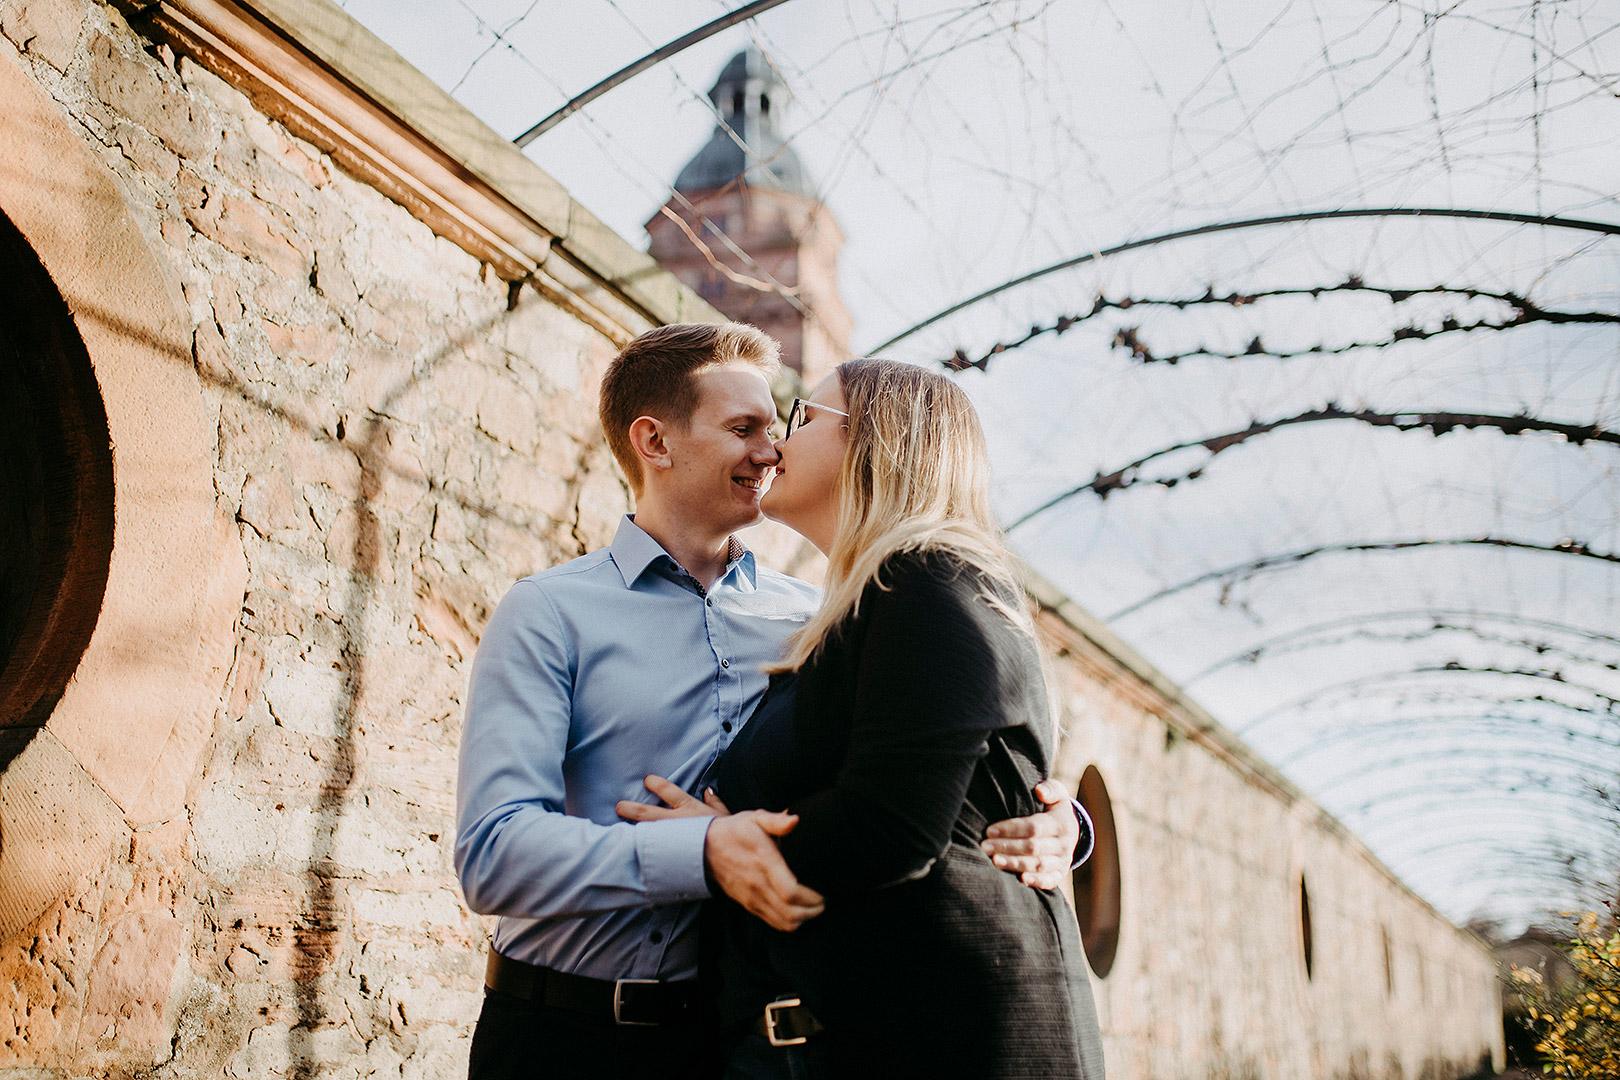 portrait_couple_saskiaunddavid_20